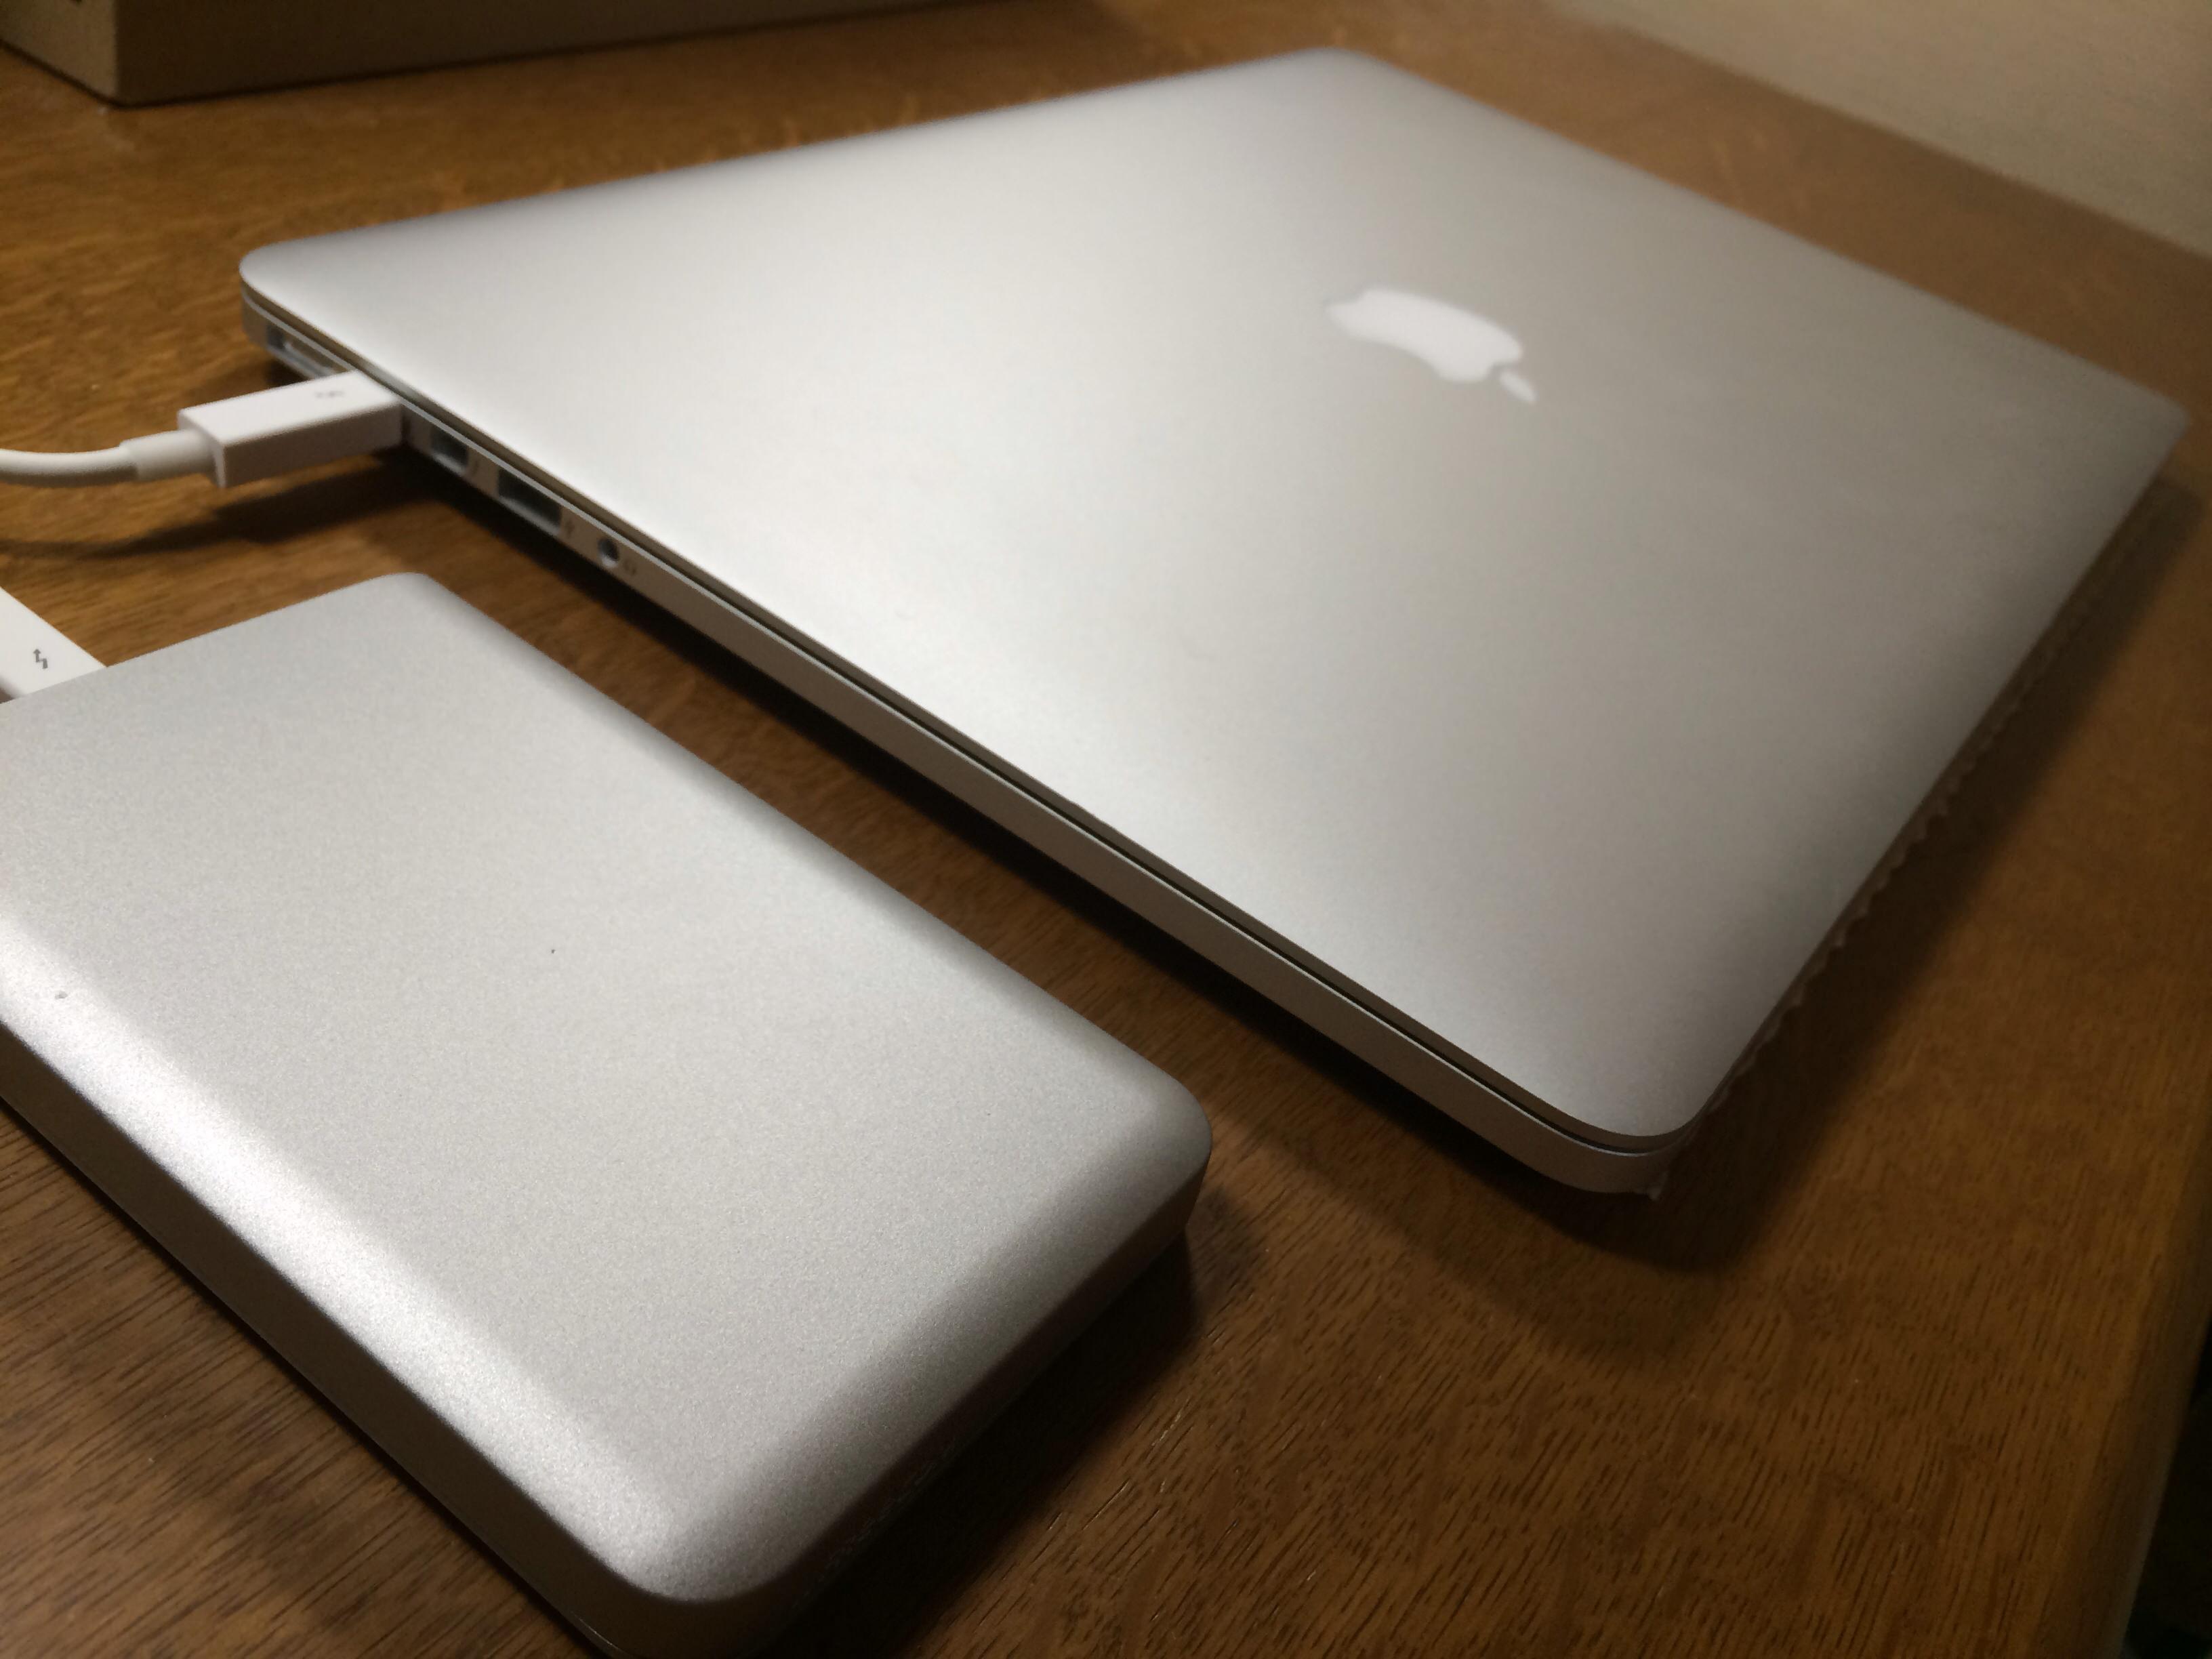 MacBookの素敵なデザインとも完全にマッチ!